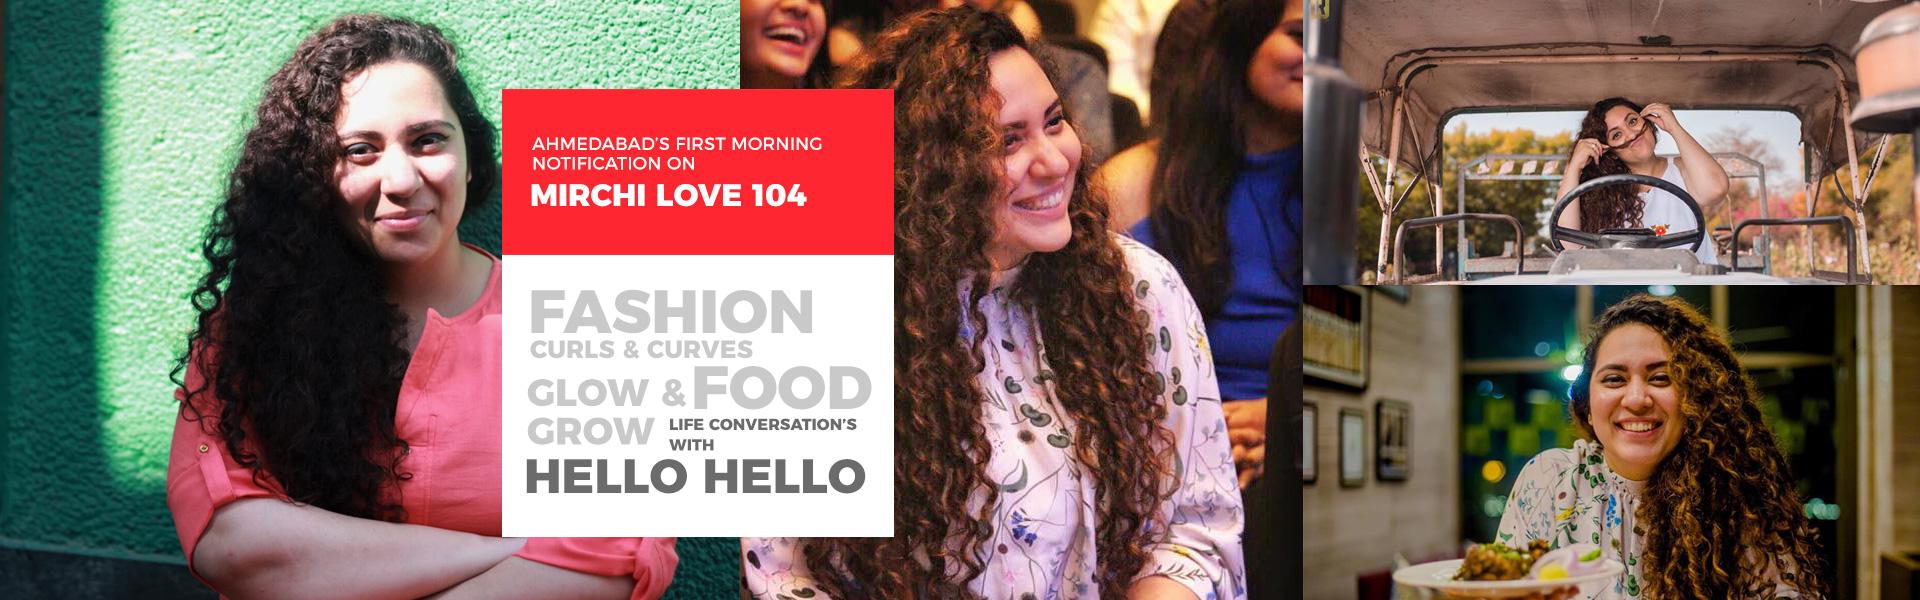 Ekta Sandhir Curls & Curves Ahmedabad's First Morning Notification On Mirchi Love 104 Food Fashion Life Conversation's with Hello Hello Glow & Grow